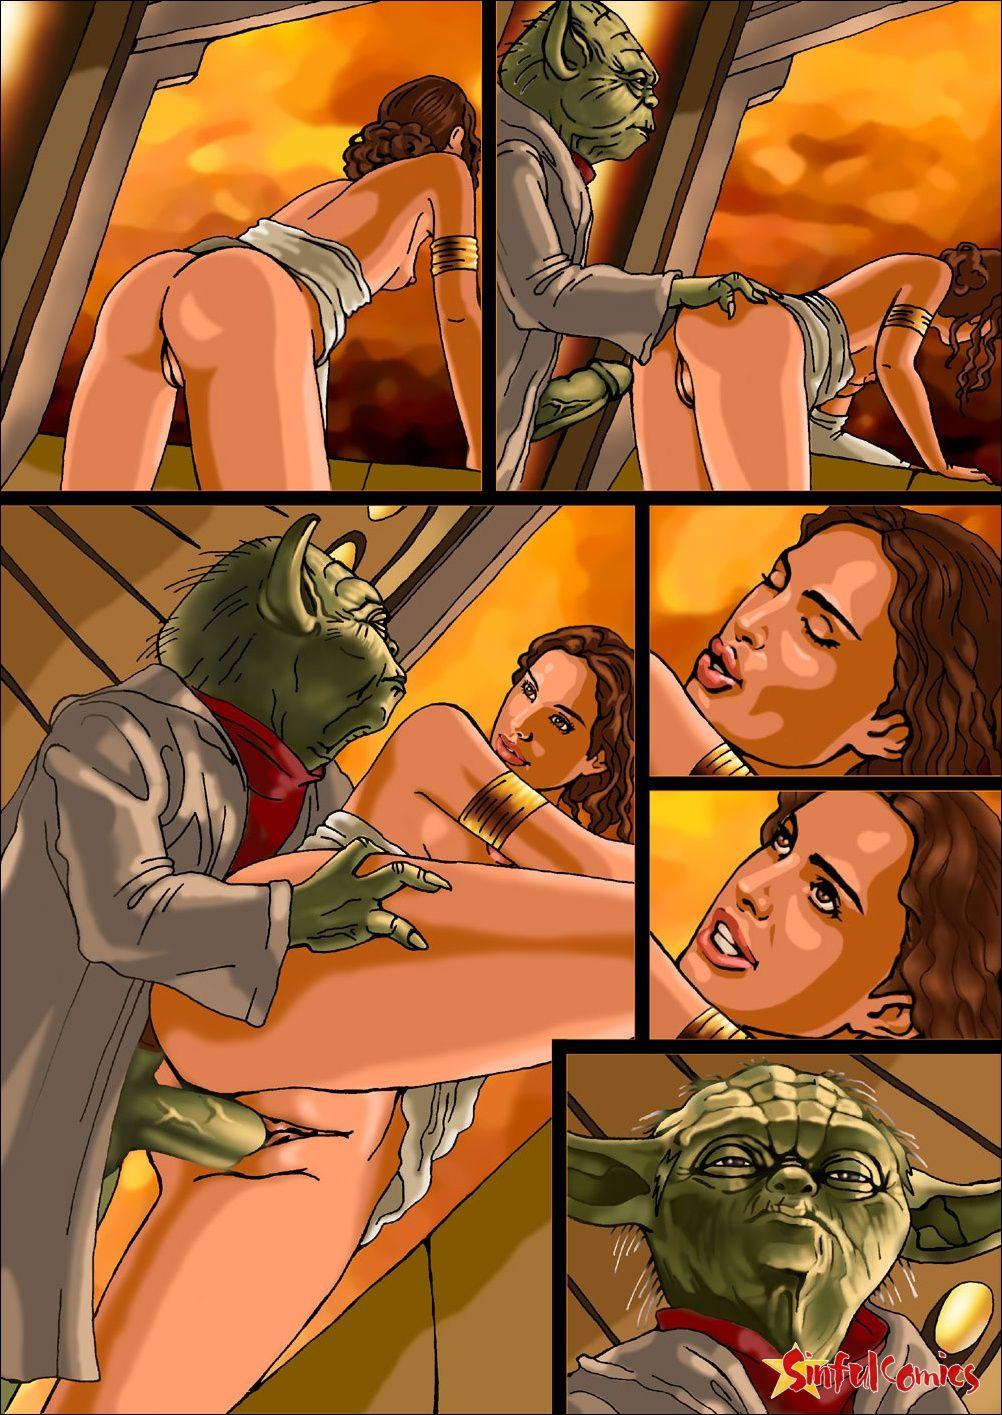 Jedi sex videos